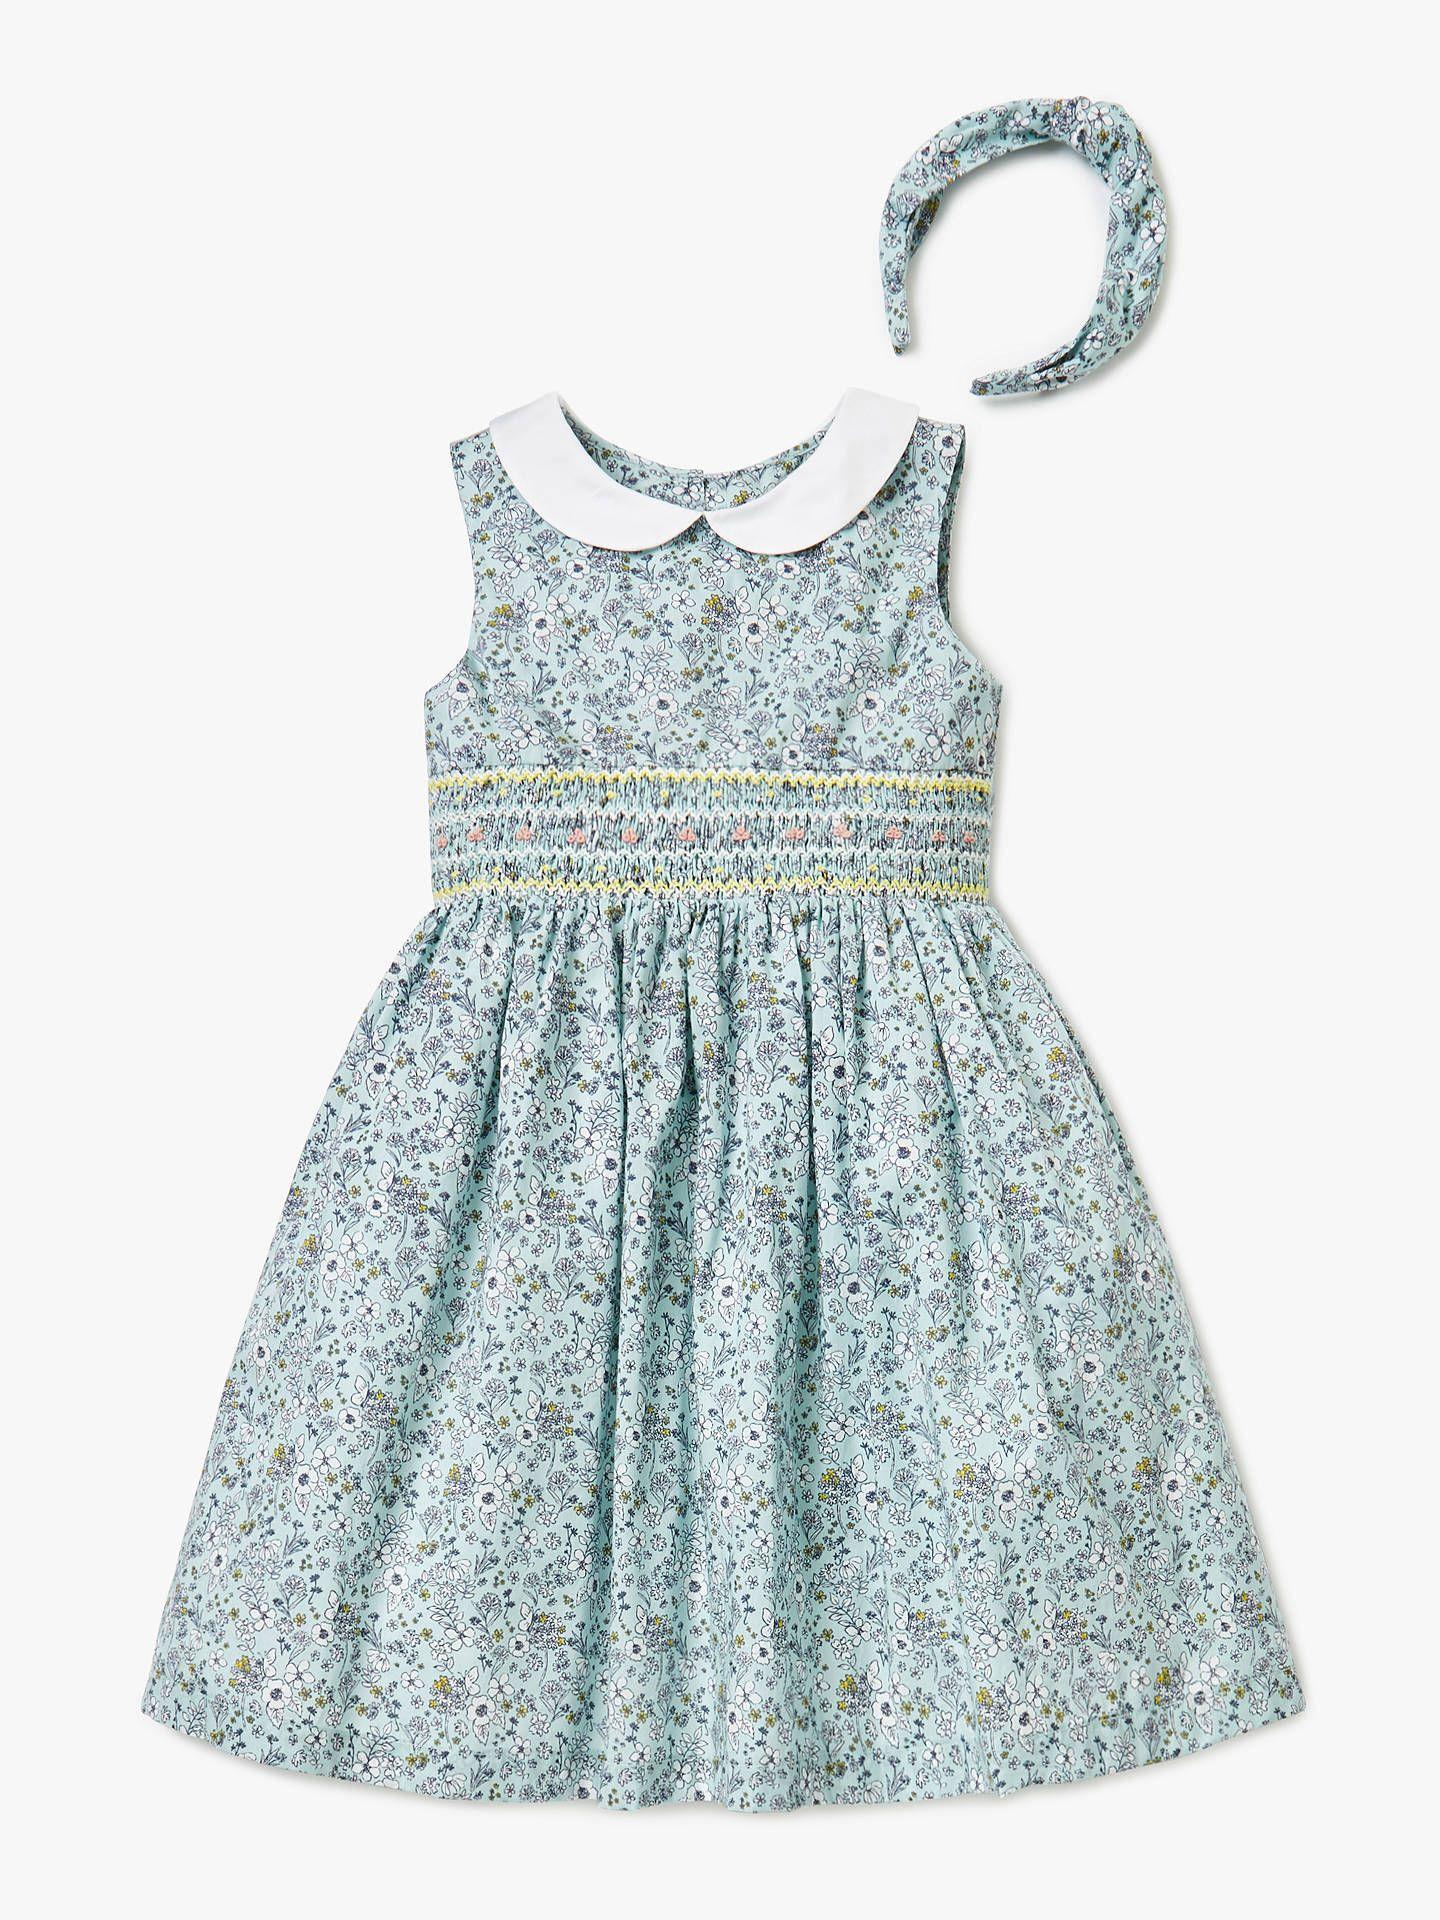 cd53cf860 John Lewis & Partners Heirloom Collection Girls' Ditsy Floral Dress, Blue  at John Lewis